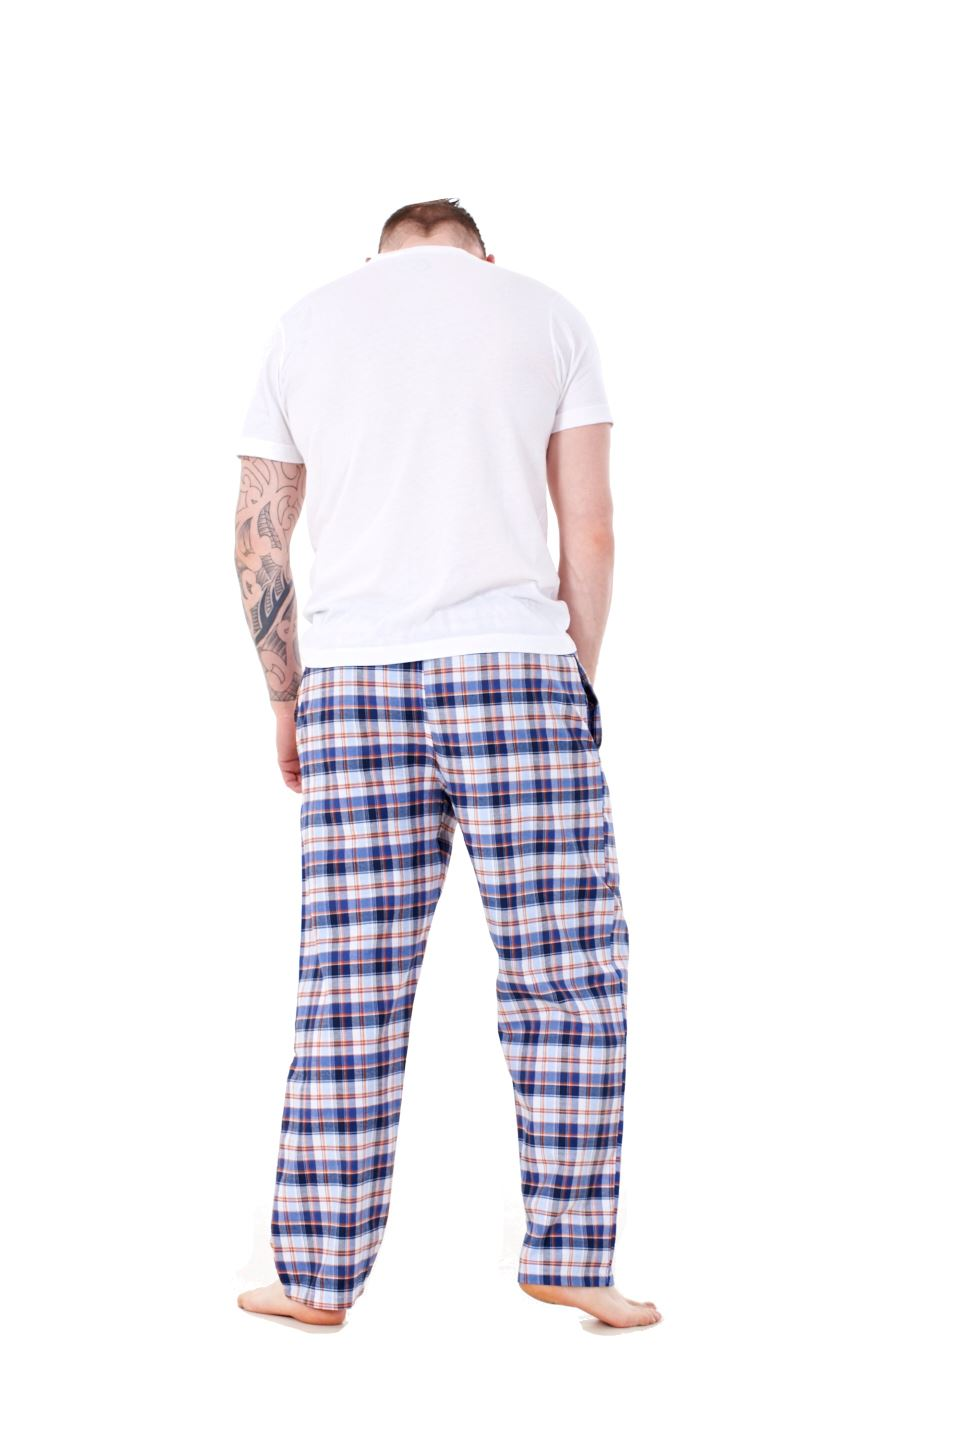 Mens-Pyjama-Bottoms-Rich-Cotton-Woven-Check-Lounge-Pant-Nightwear-Big-3XL-to-5XL Indexbild 18